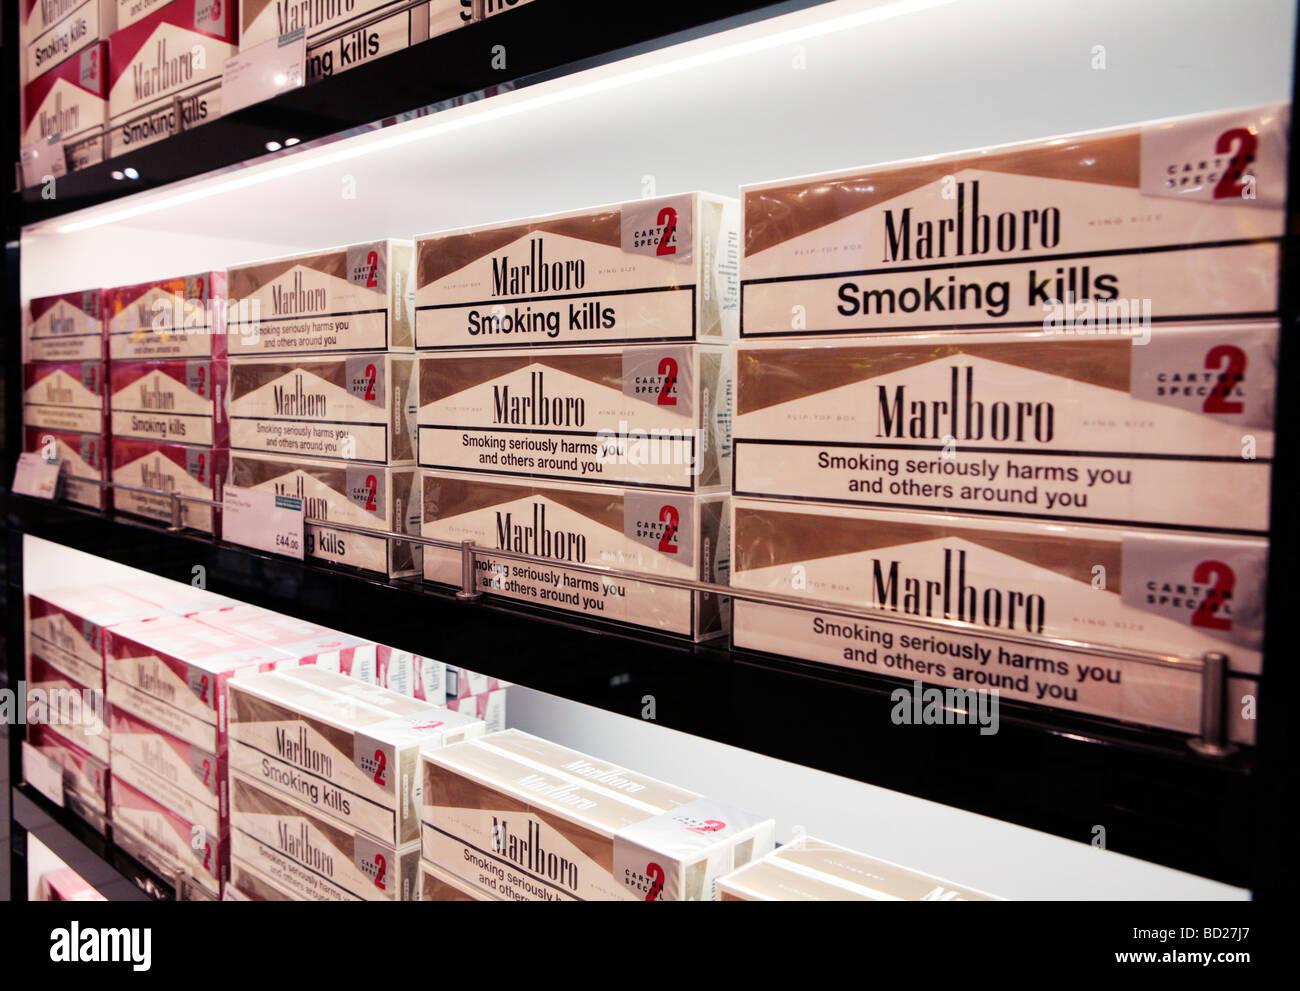 Price of a carton of Marlboro cigarettes in Virginia